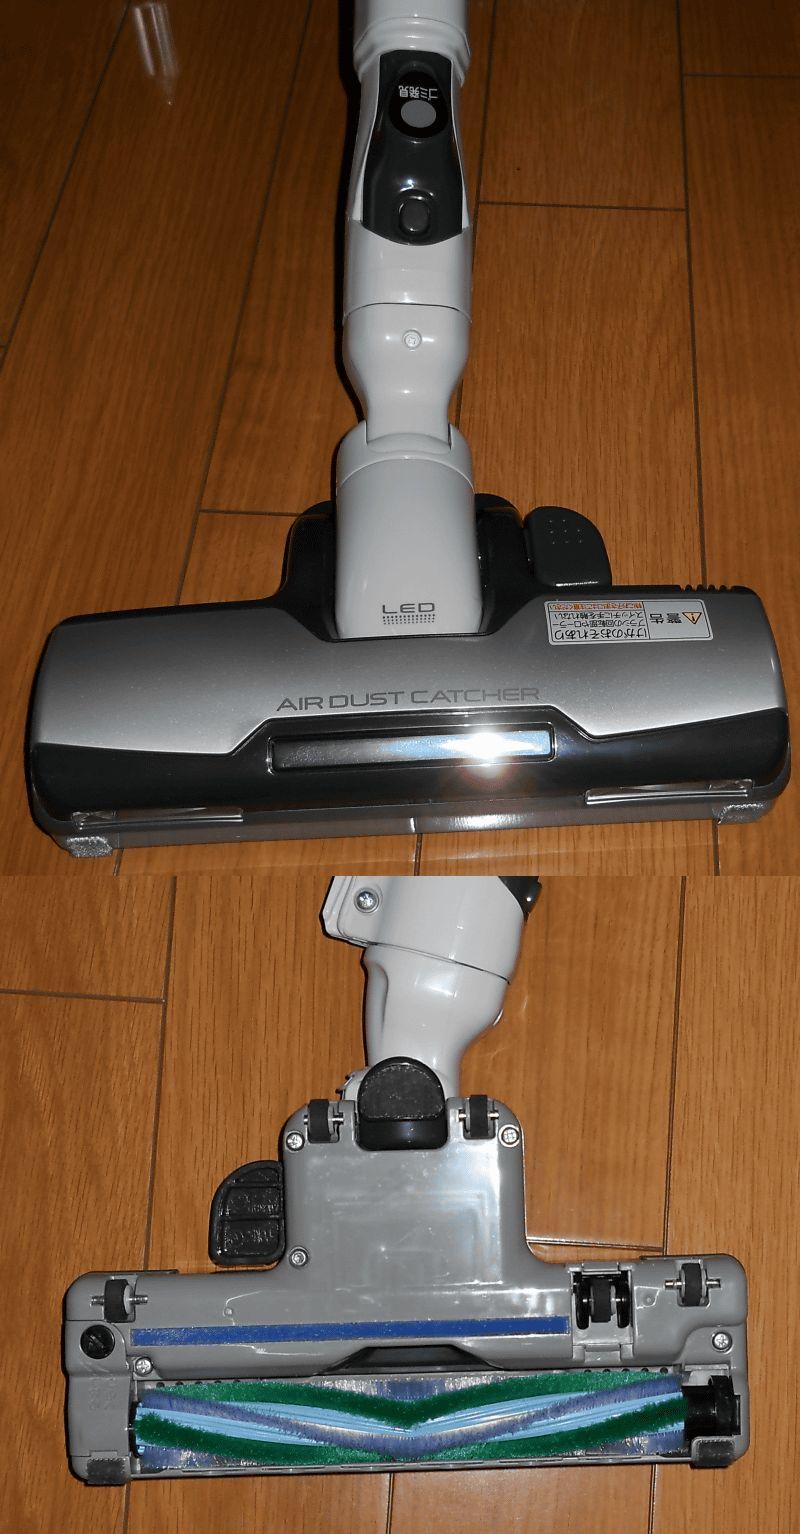 Panasonic_MC-PA23G-P_002.jpg